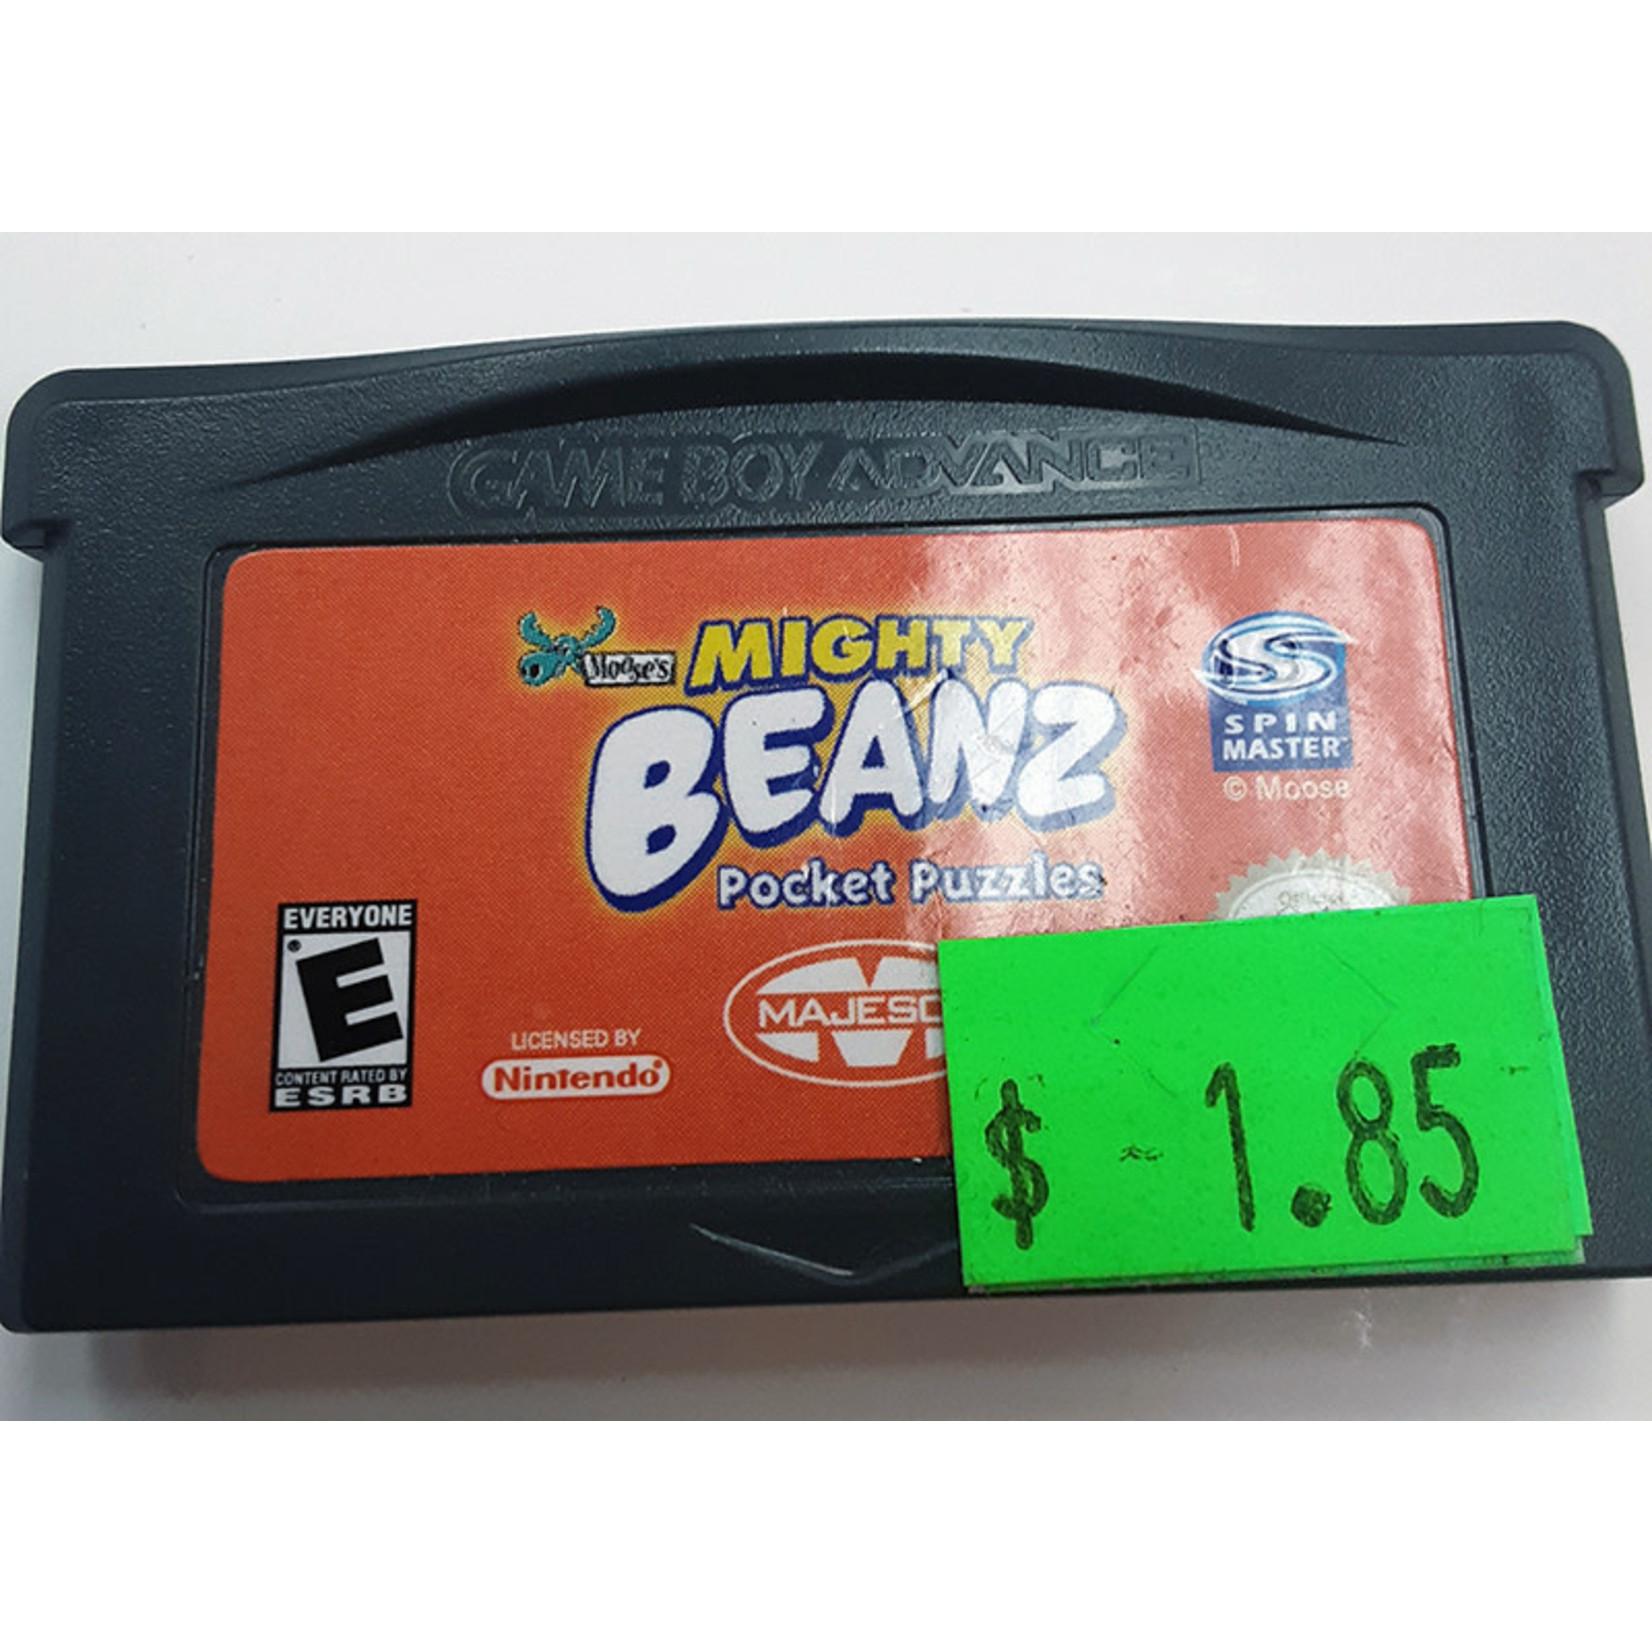 GBAu-Mighty Beanz Pocket Puzzles (cartridge)